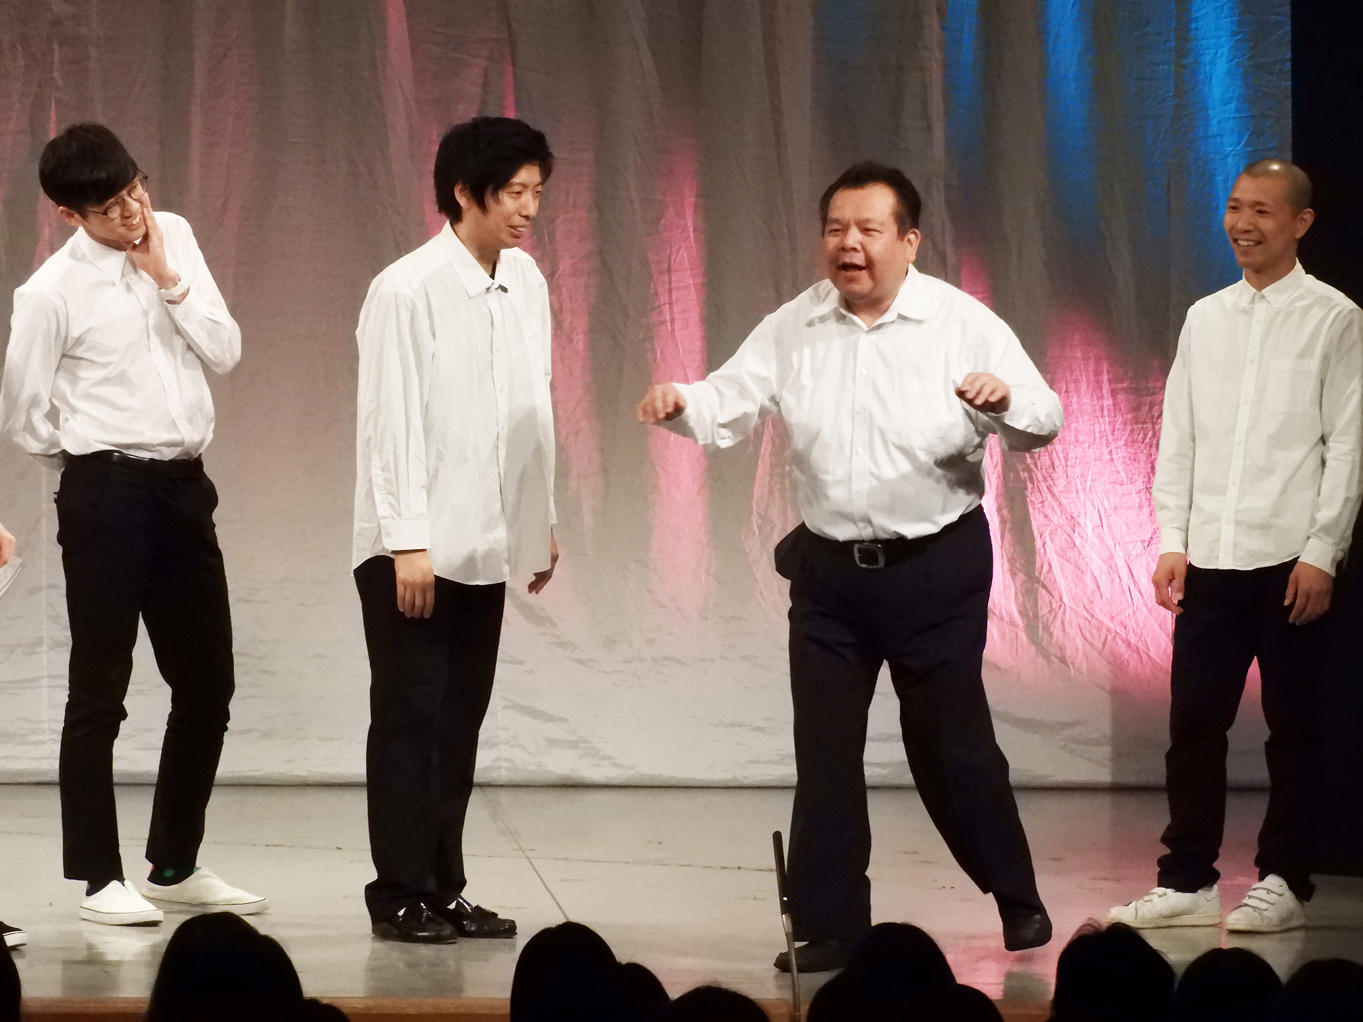 http://news.yoshimoto.co.jp/20180312103318-a3e1d350acb4c4b54448622f605eb234573af33e.jpg